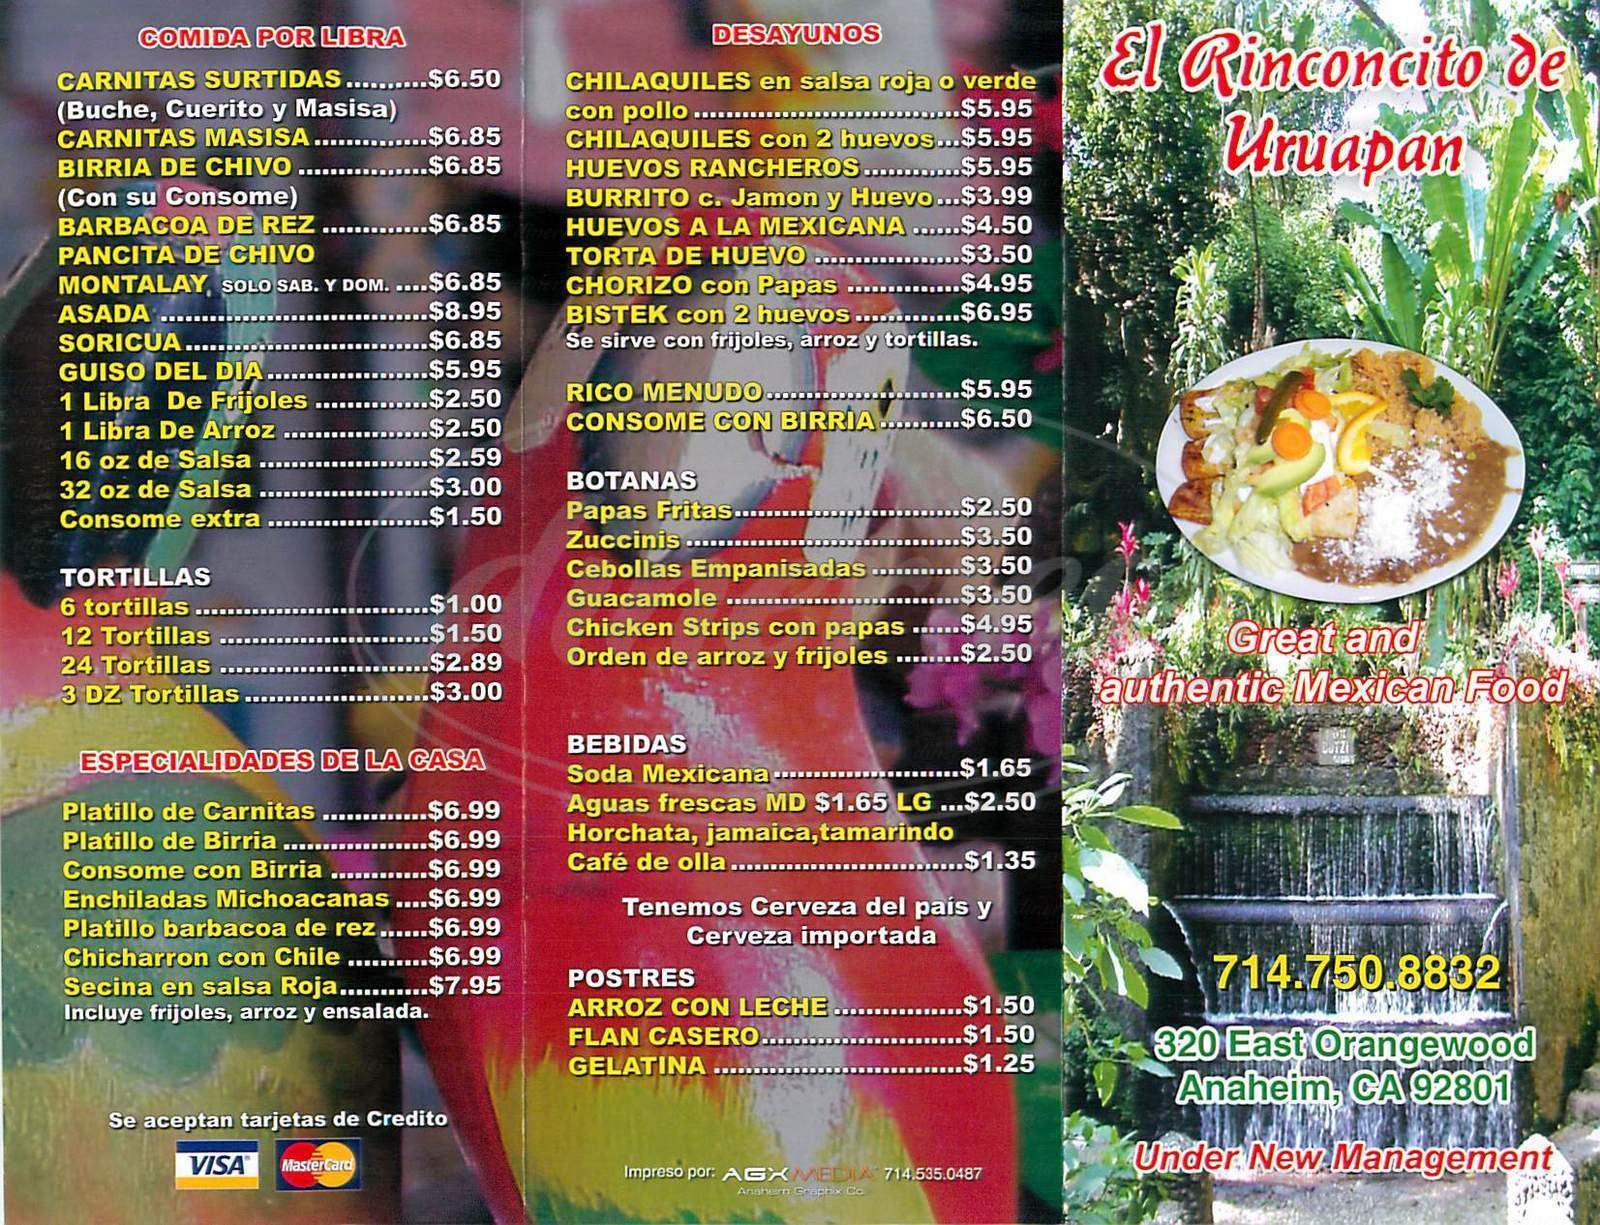 menu for El Rinconcito de Uruapan